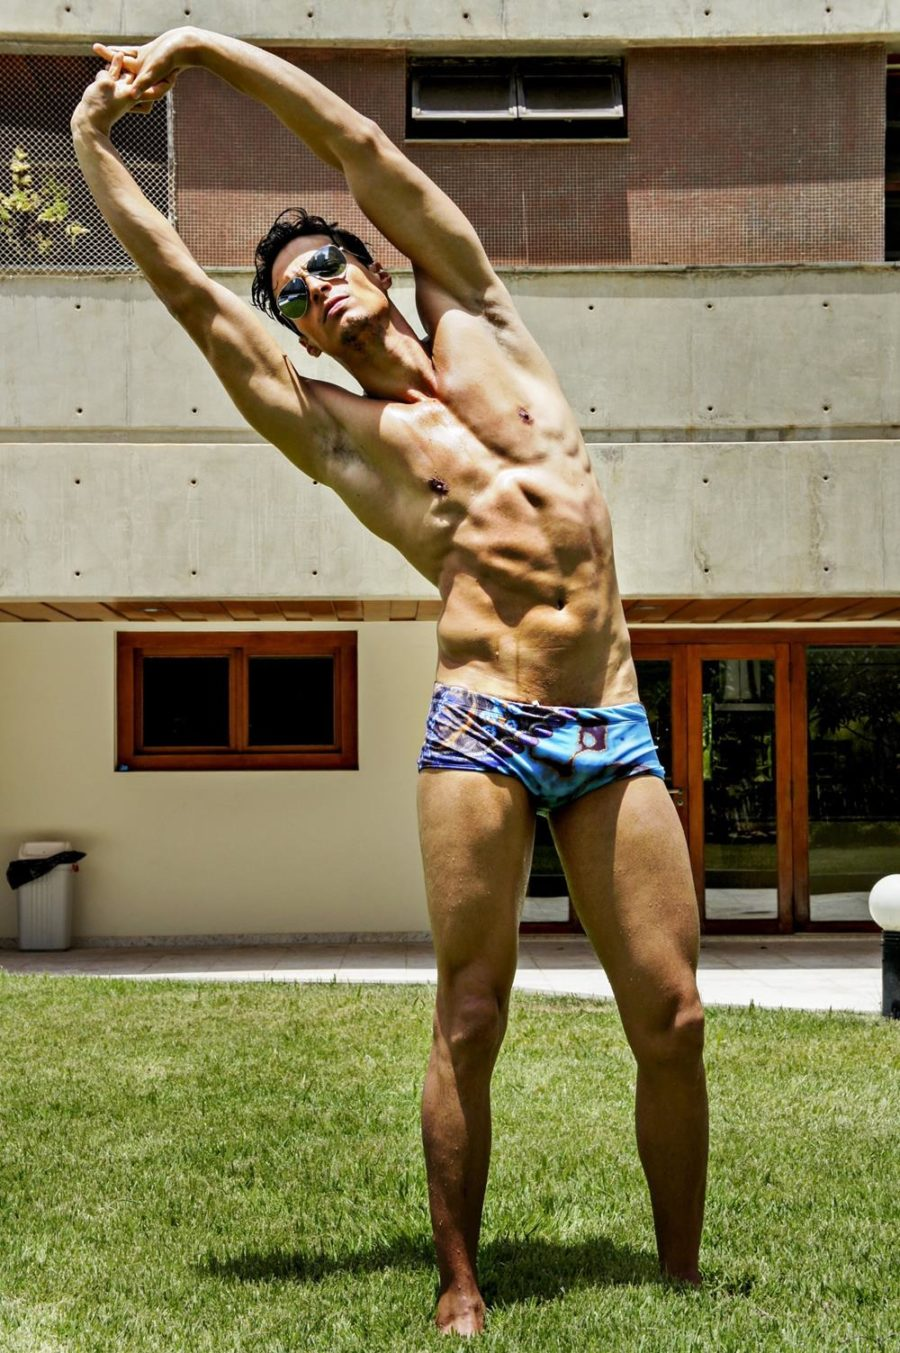 Felipe Anibal by Mattheus Lian